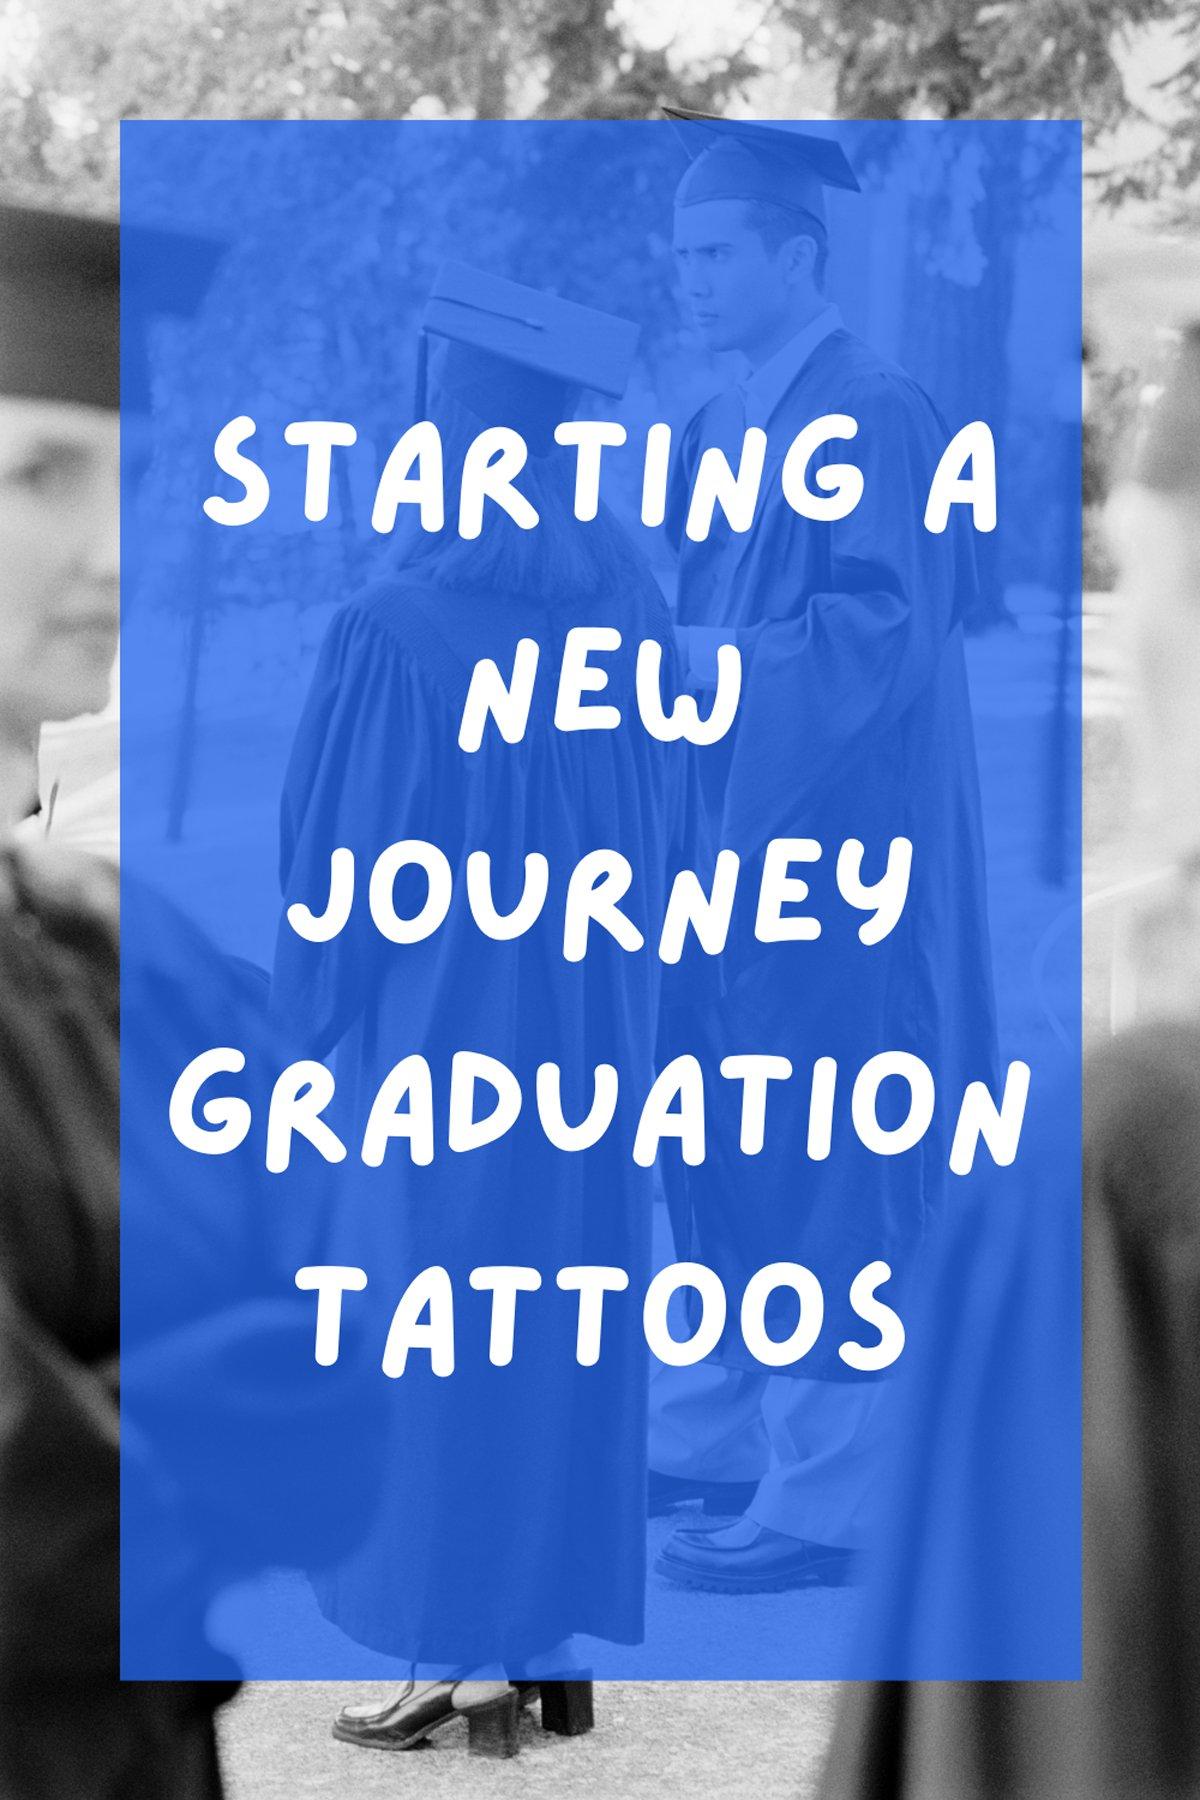 Graduation Tattoos